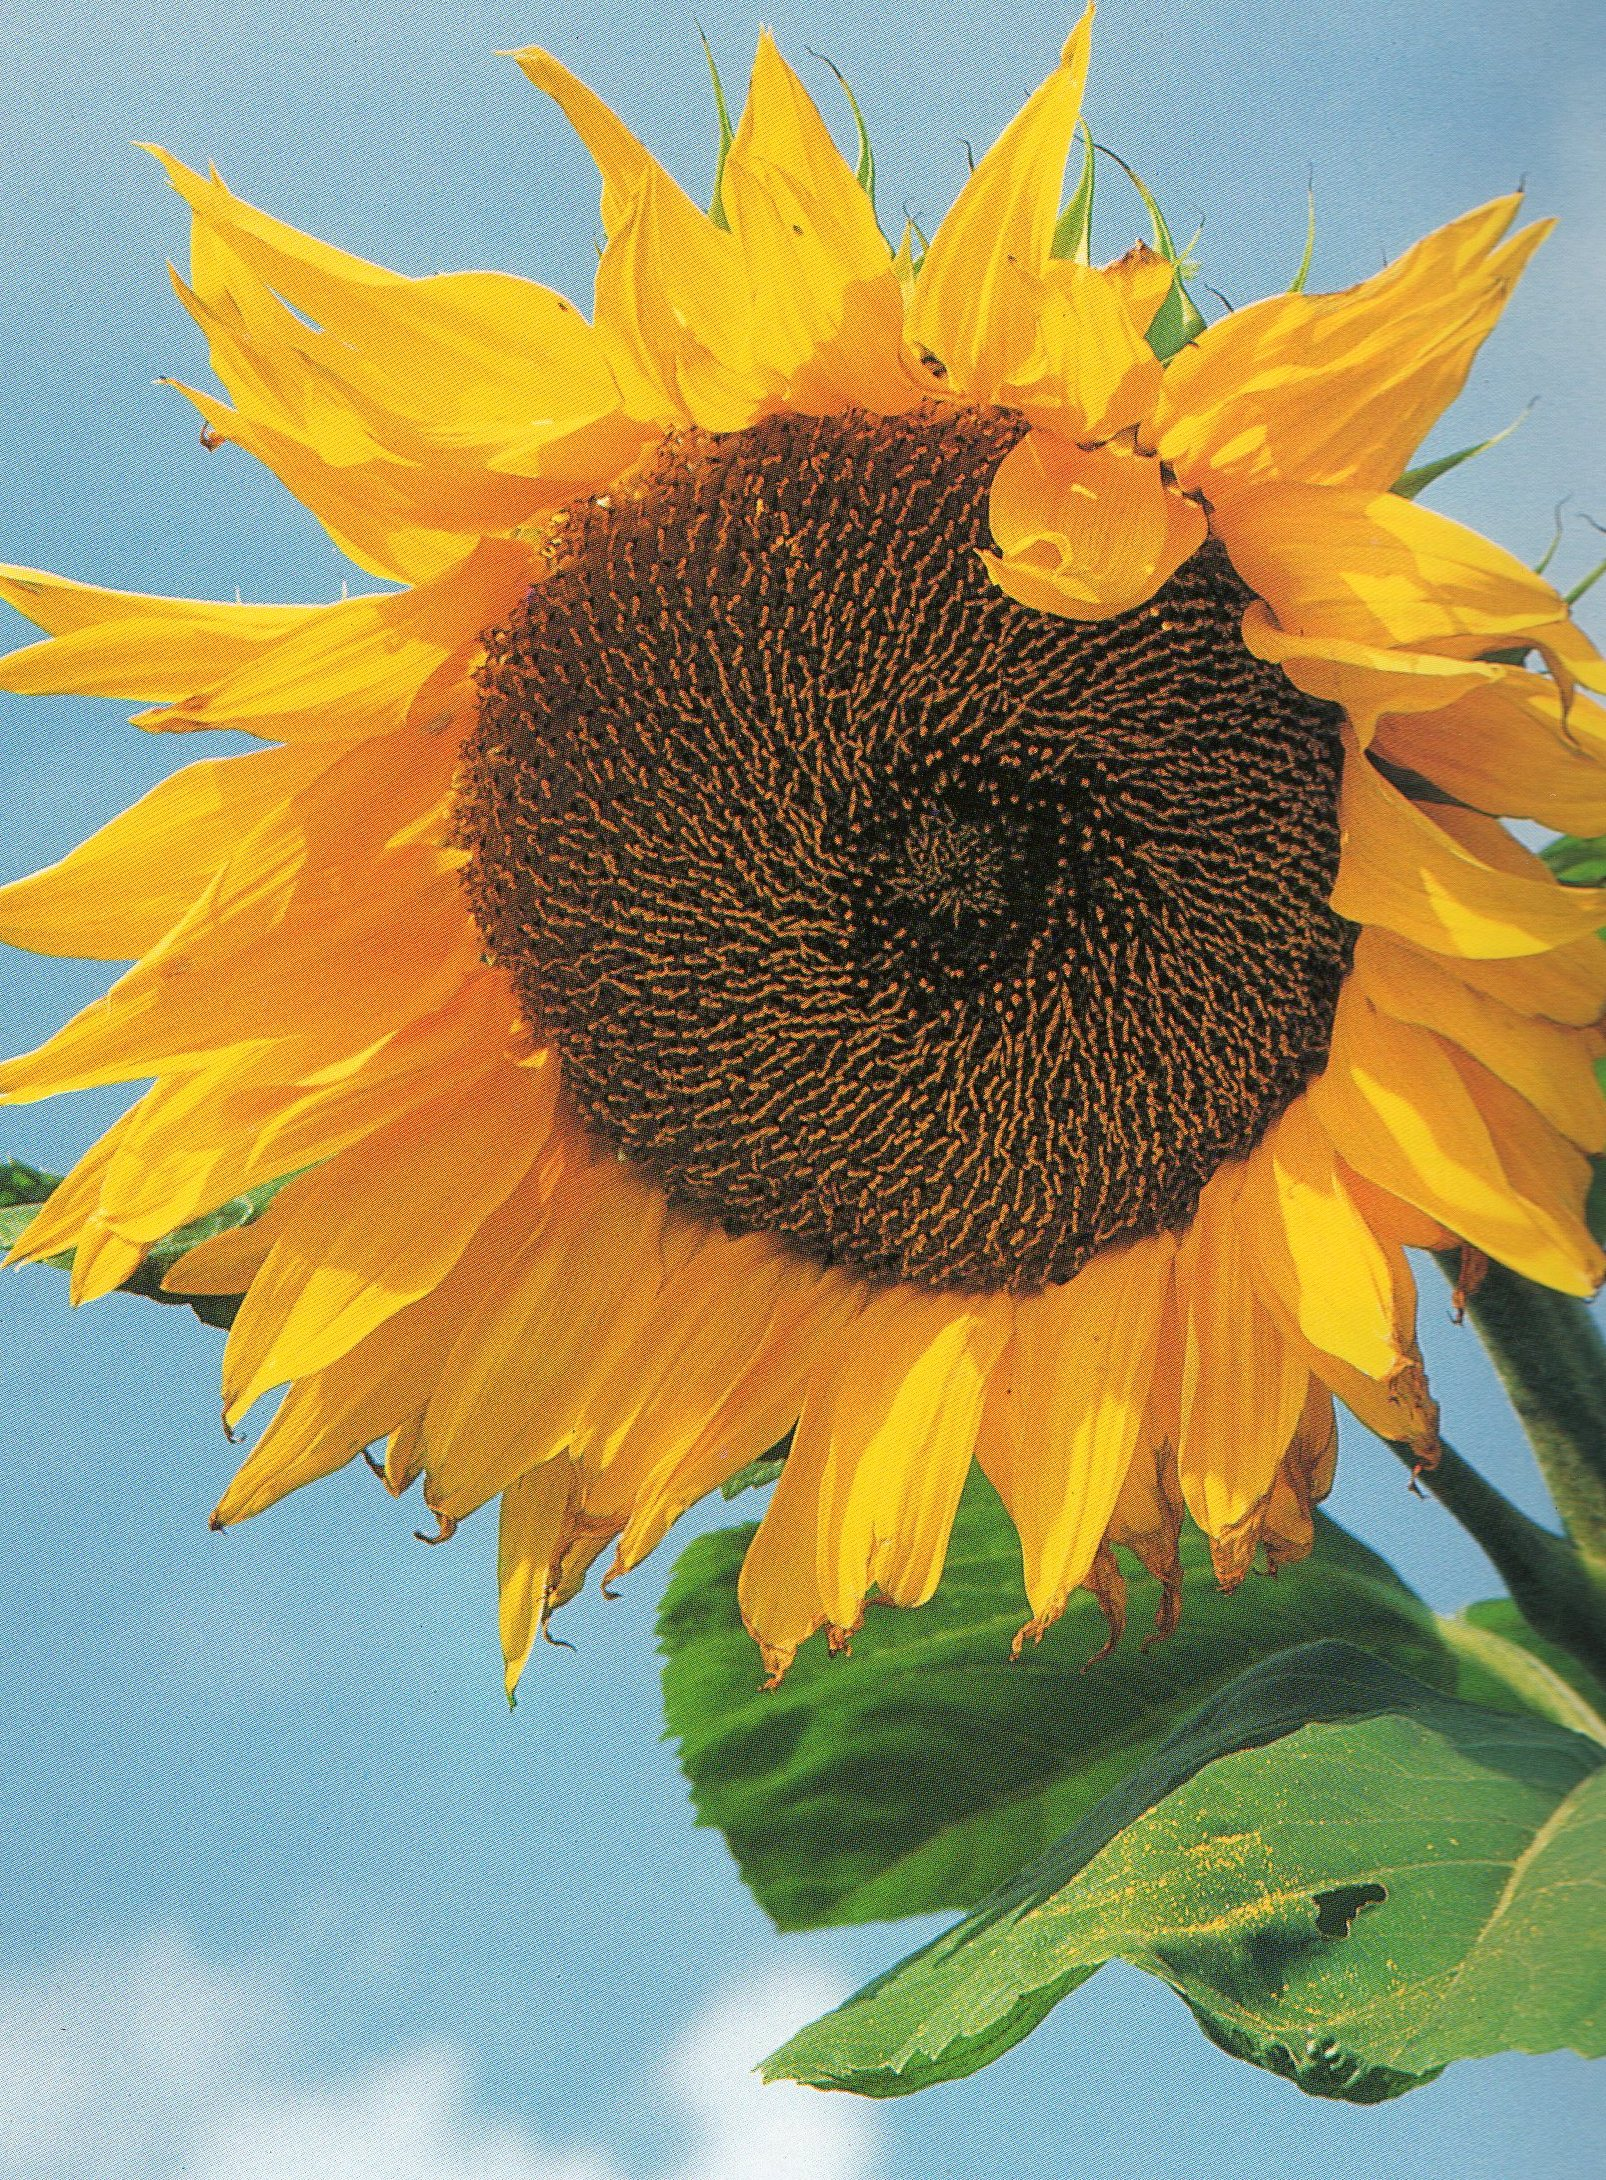 Titanic Sunflower Titan The Biggest Sunflower